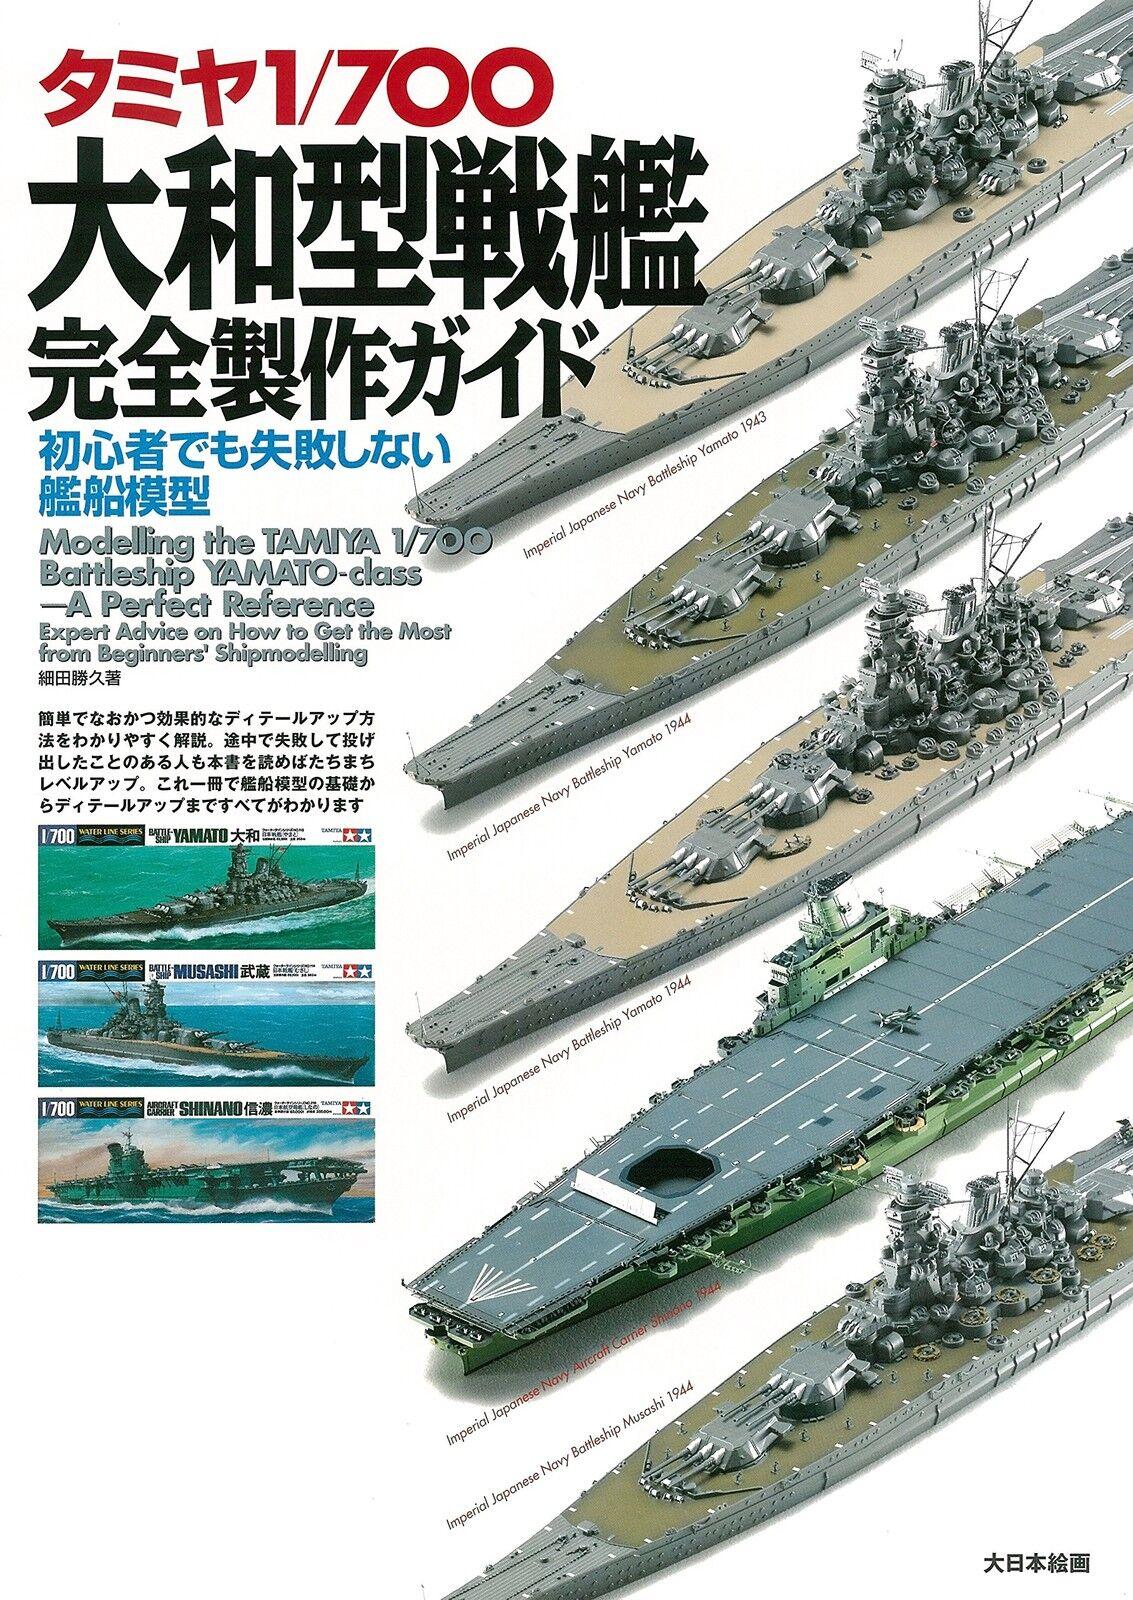 How to Build Model Kit Book   TAMIYA 1 700 YAMATO Model Battleship Guide